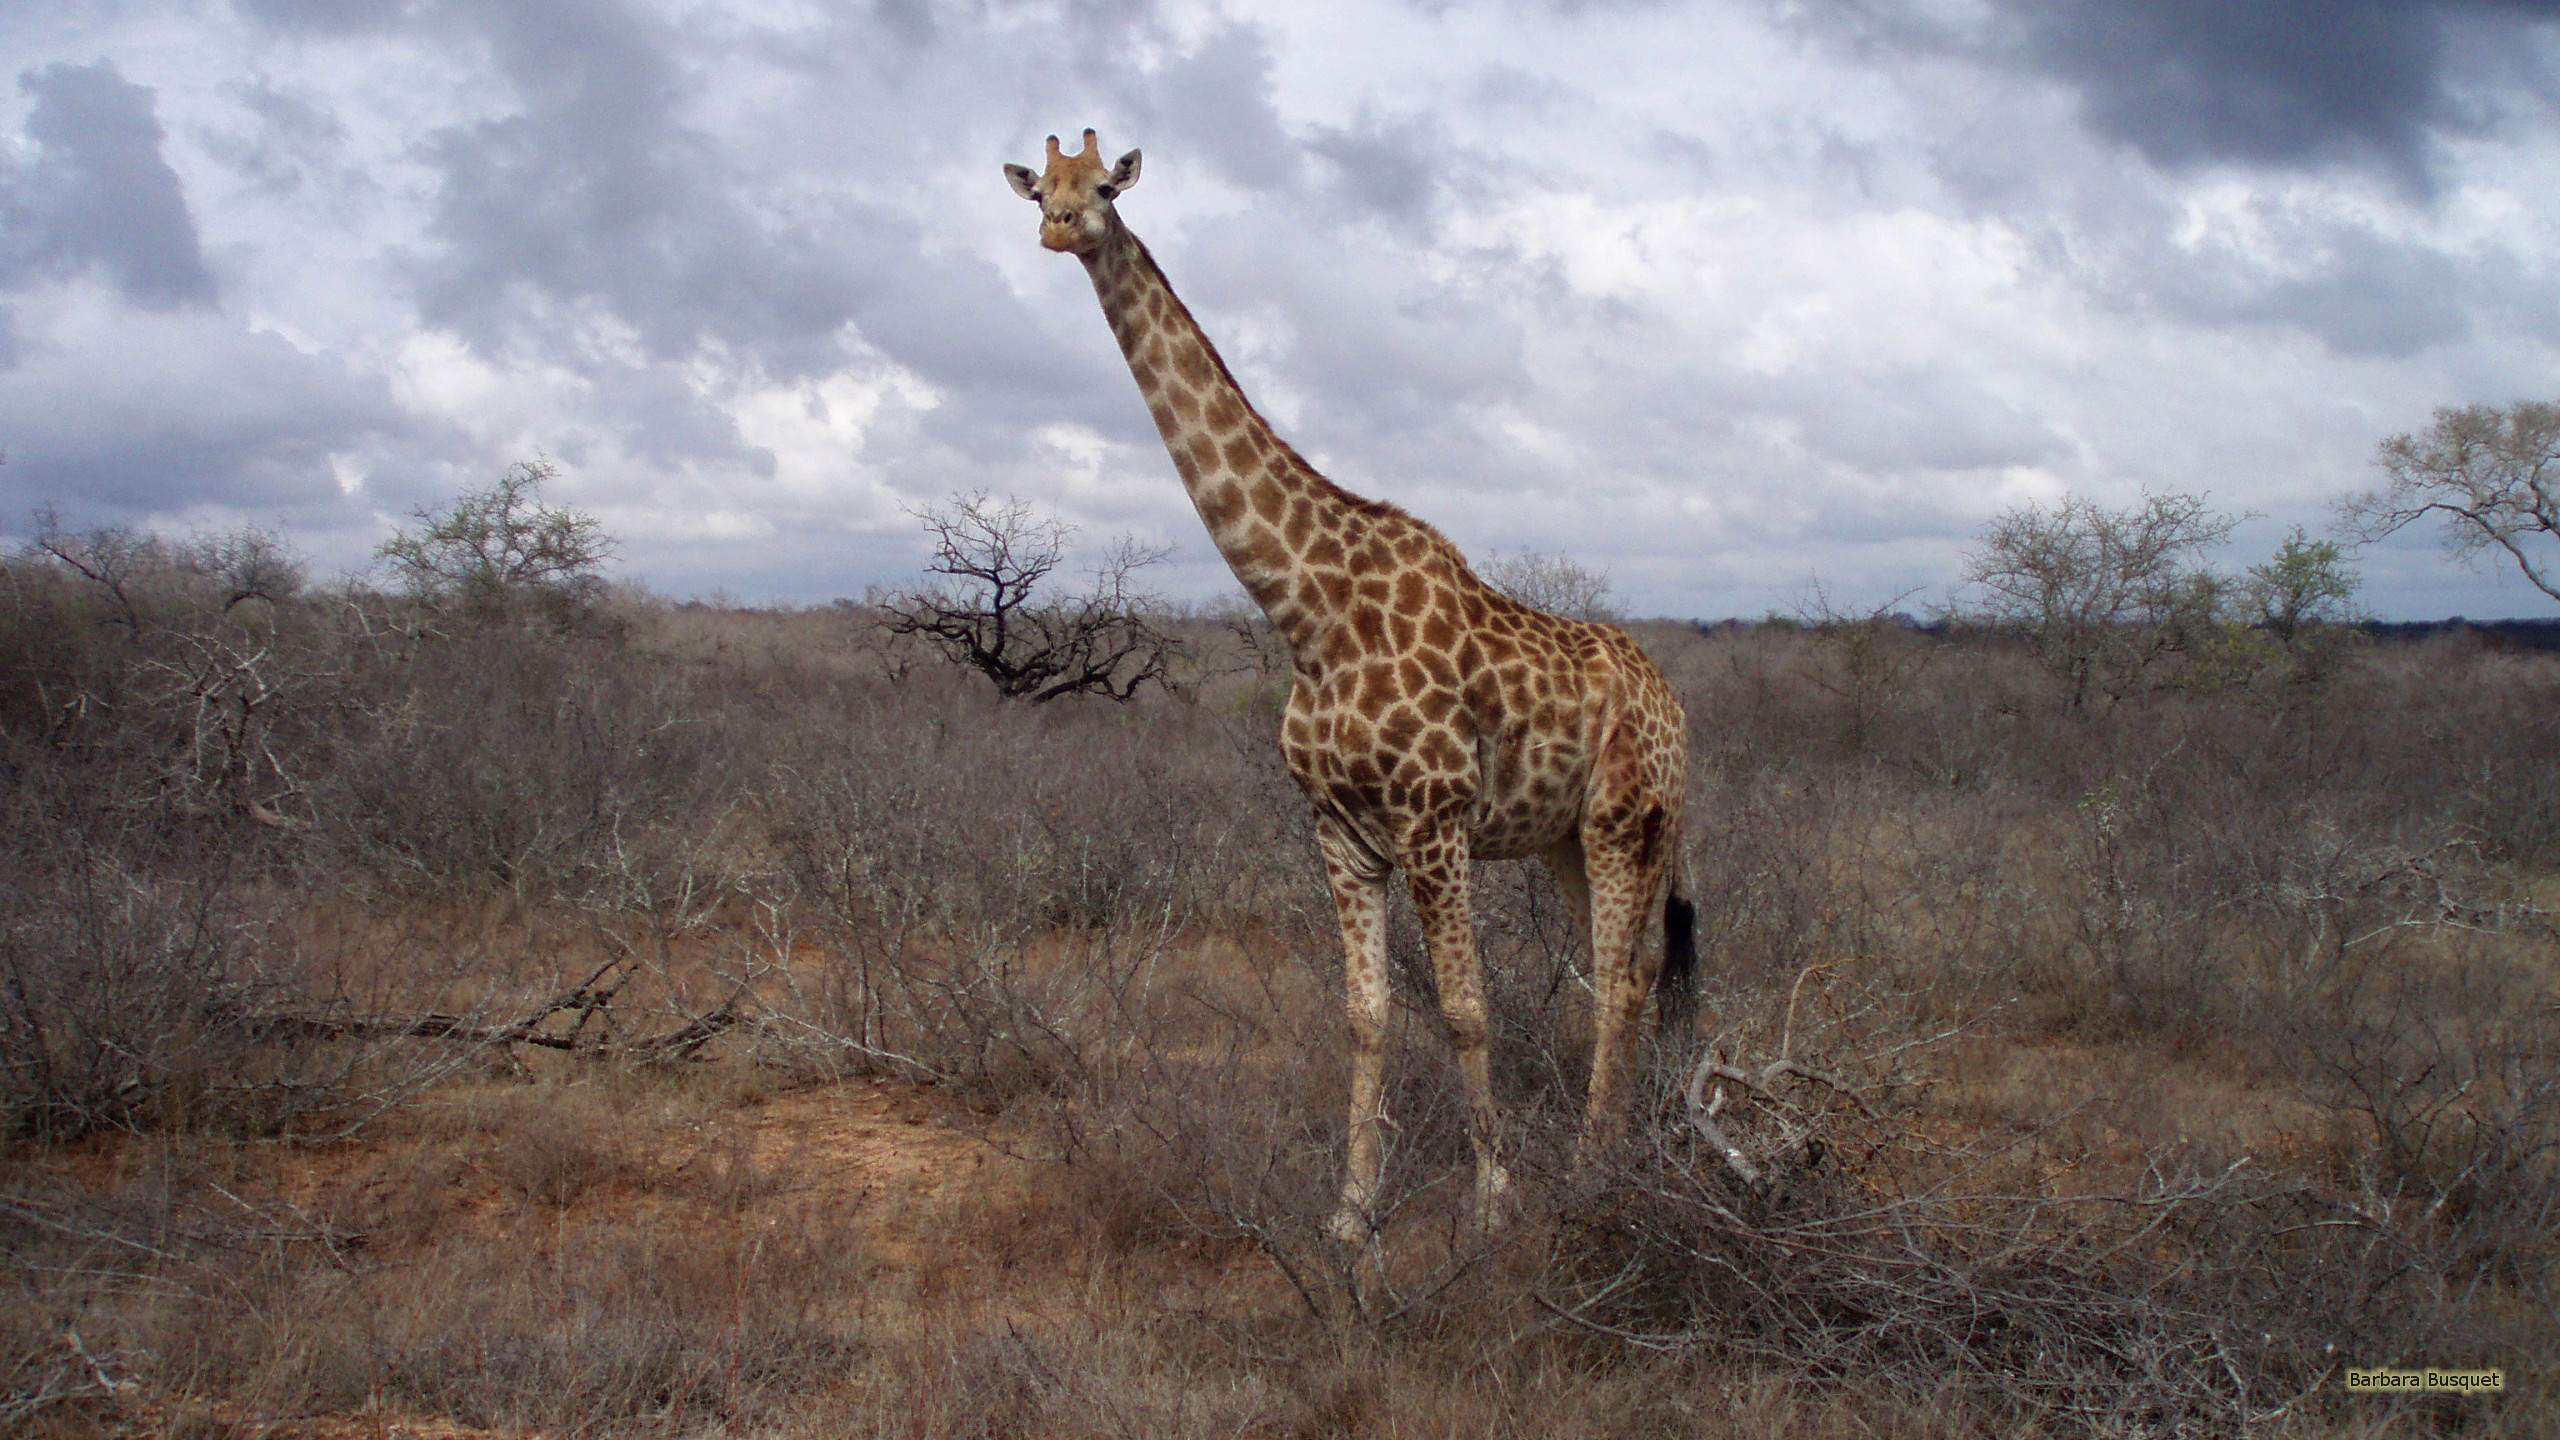 Giraffe Wallpapers - Barbaras HD Wallpapers Giraffe Skin Pattern